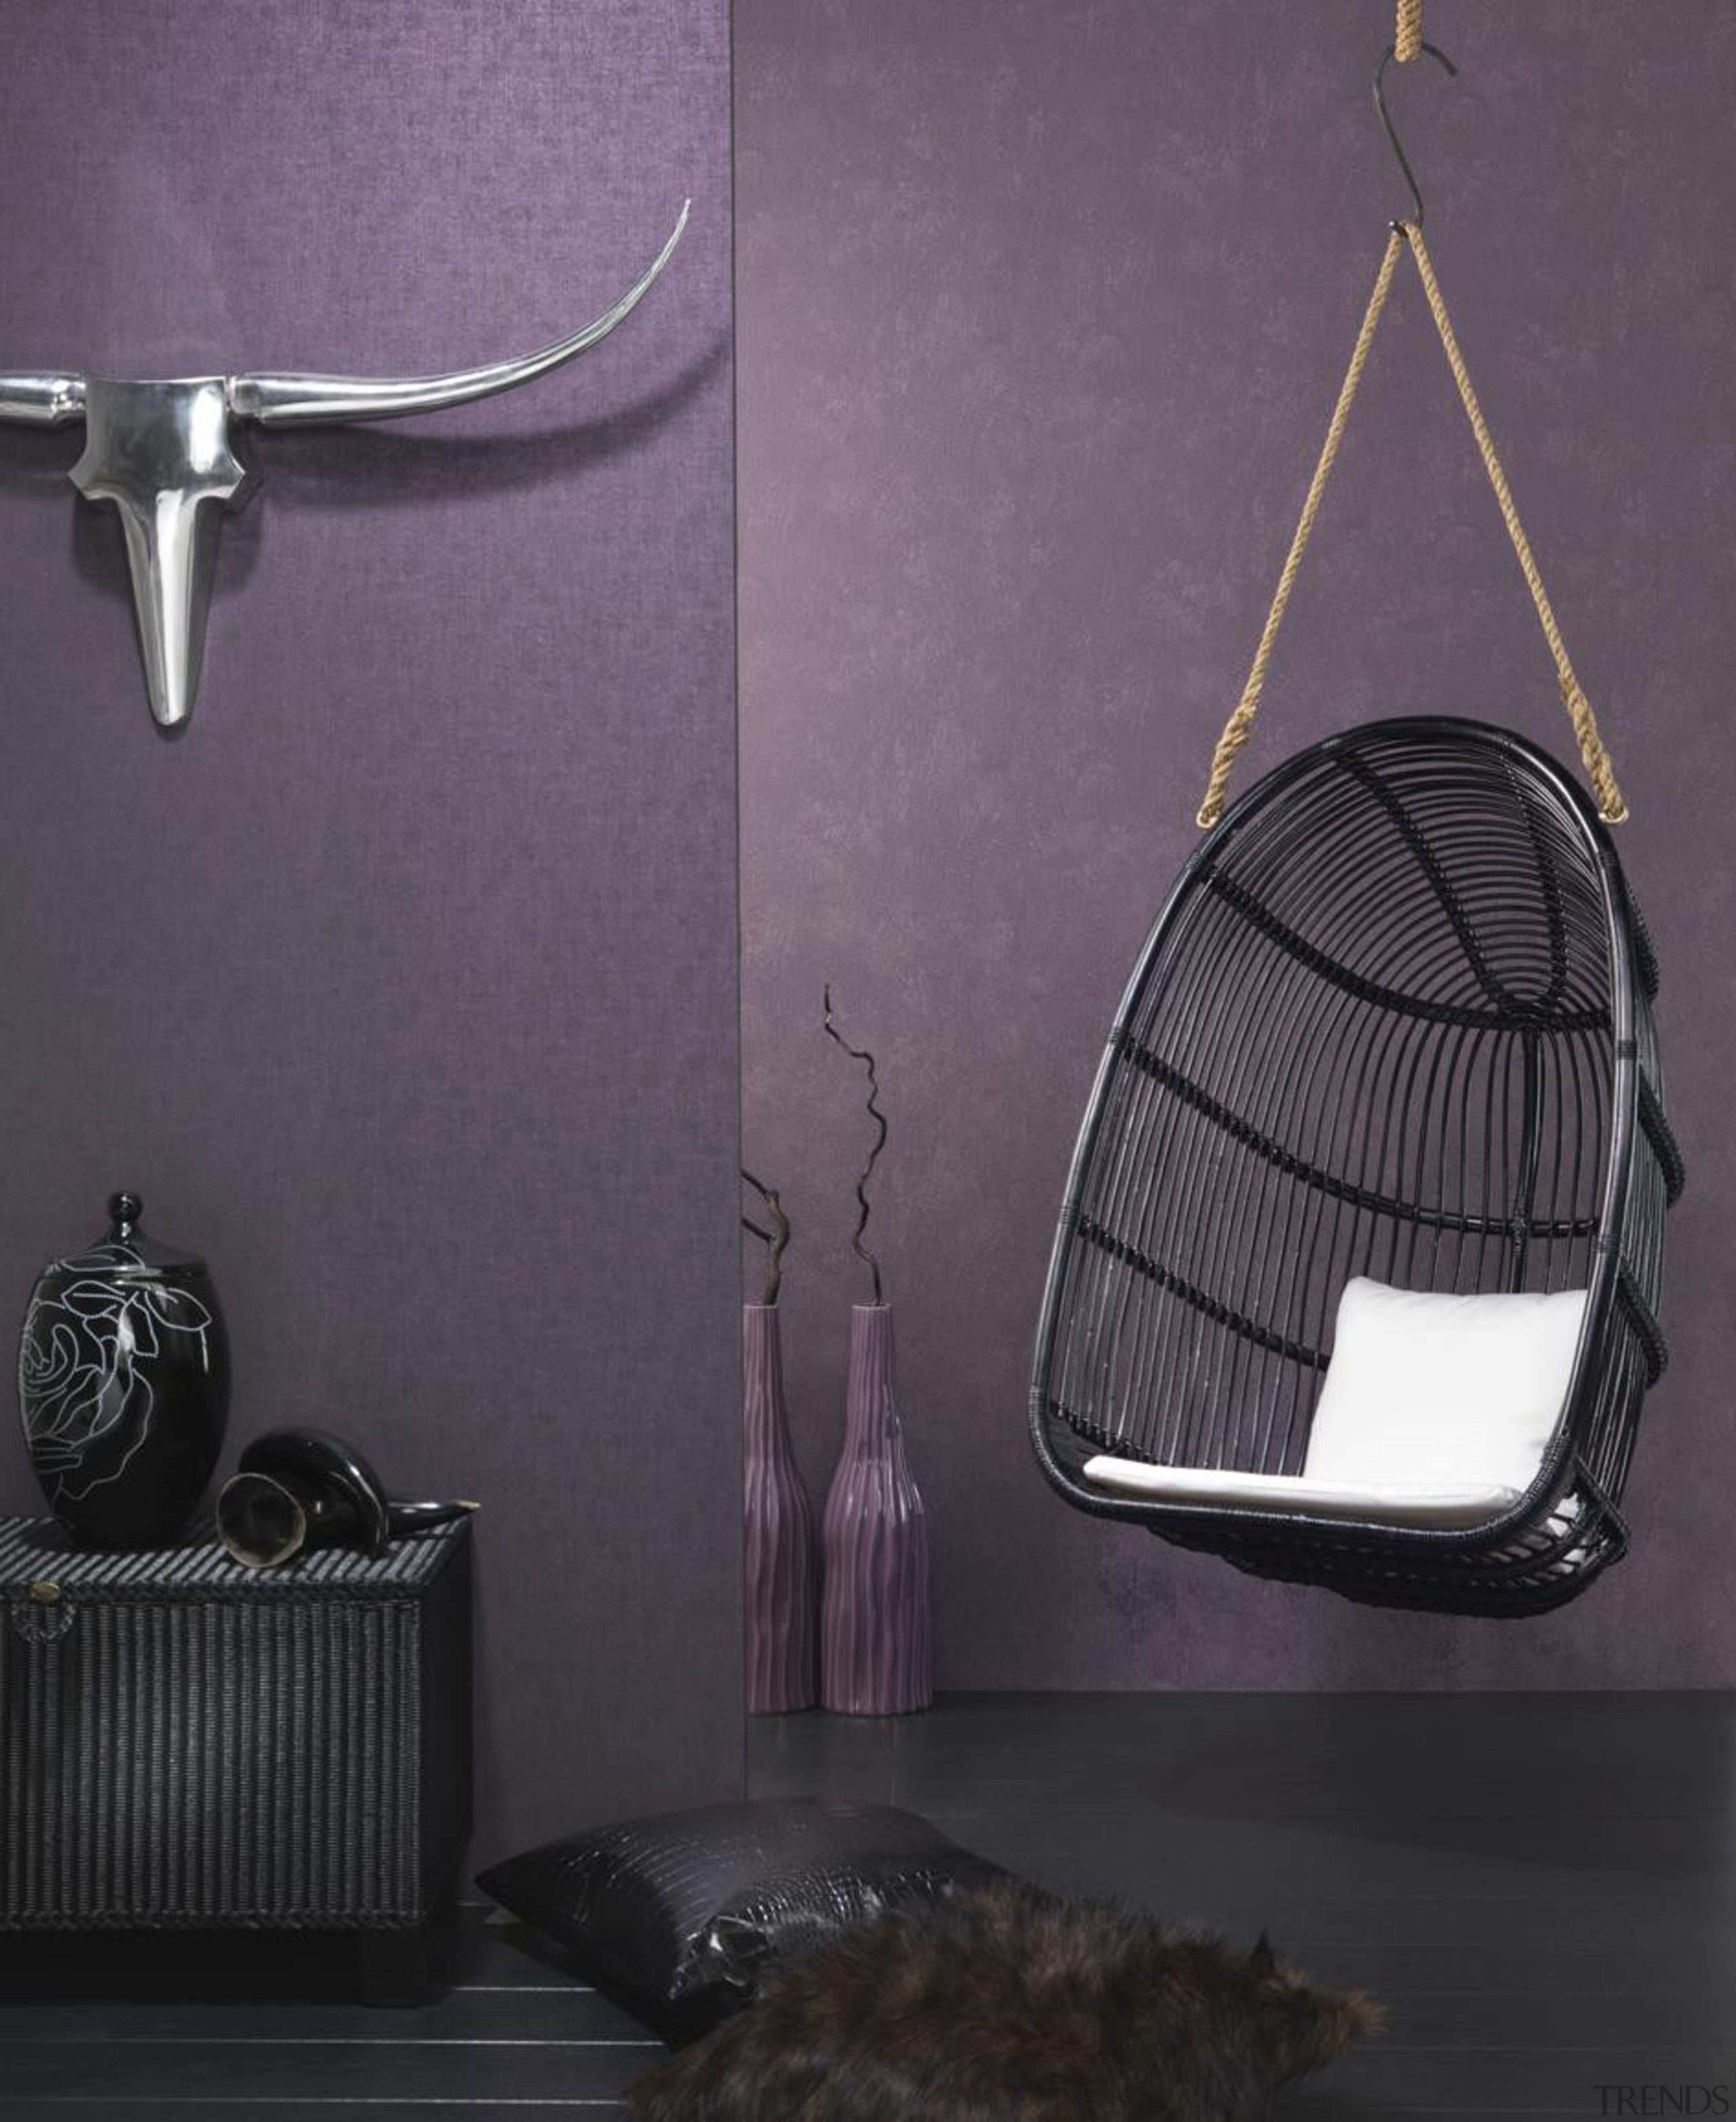 Modern Style Range - furniture   interior design furniture, interior design, lamp, light fixture, lighting, product, product design, purple, gray, black